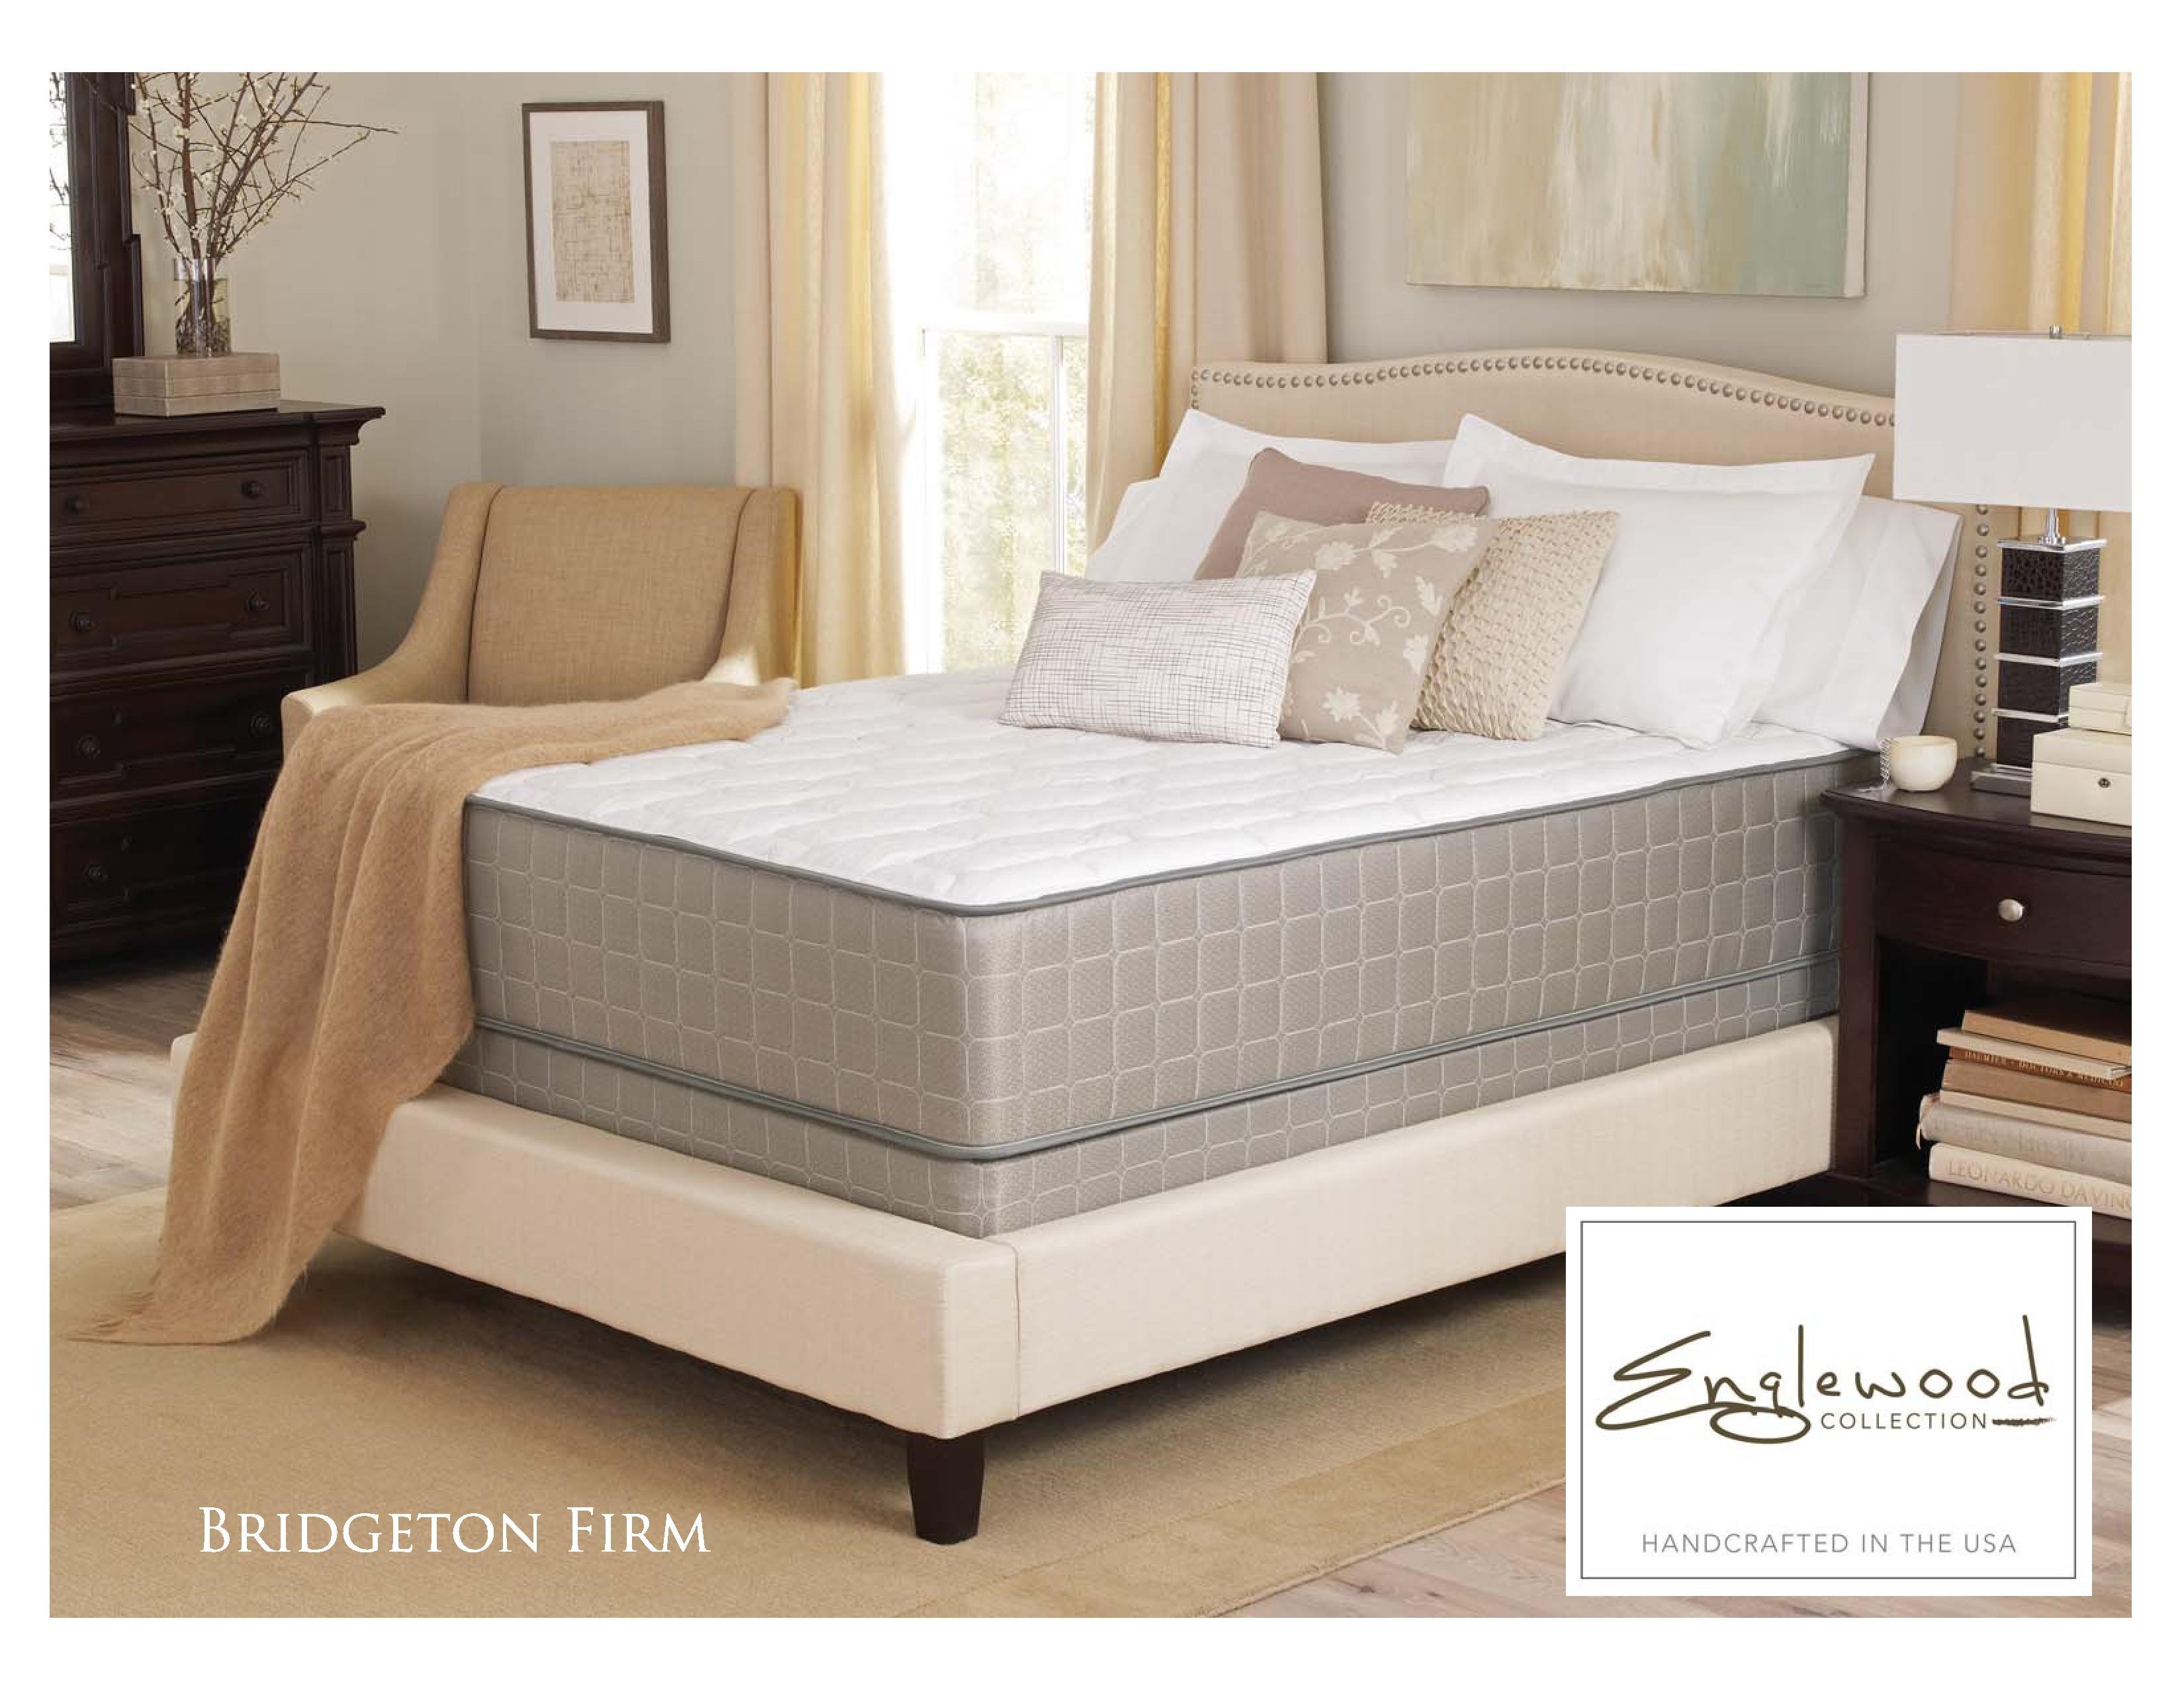 American Comfort Furniture Mattress Discount Chicago Illinois